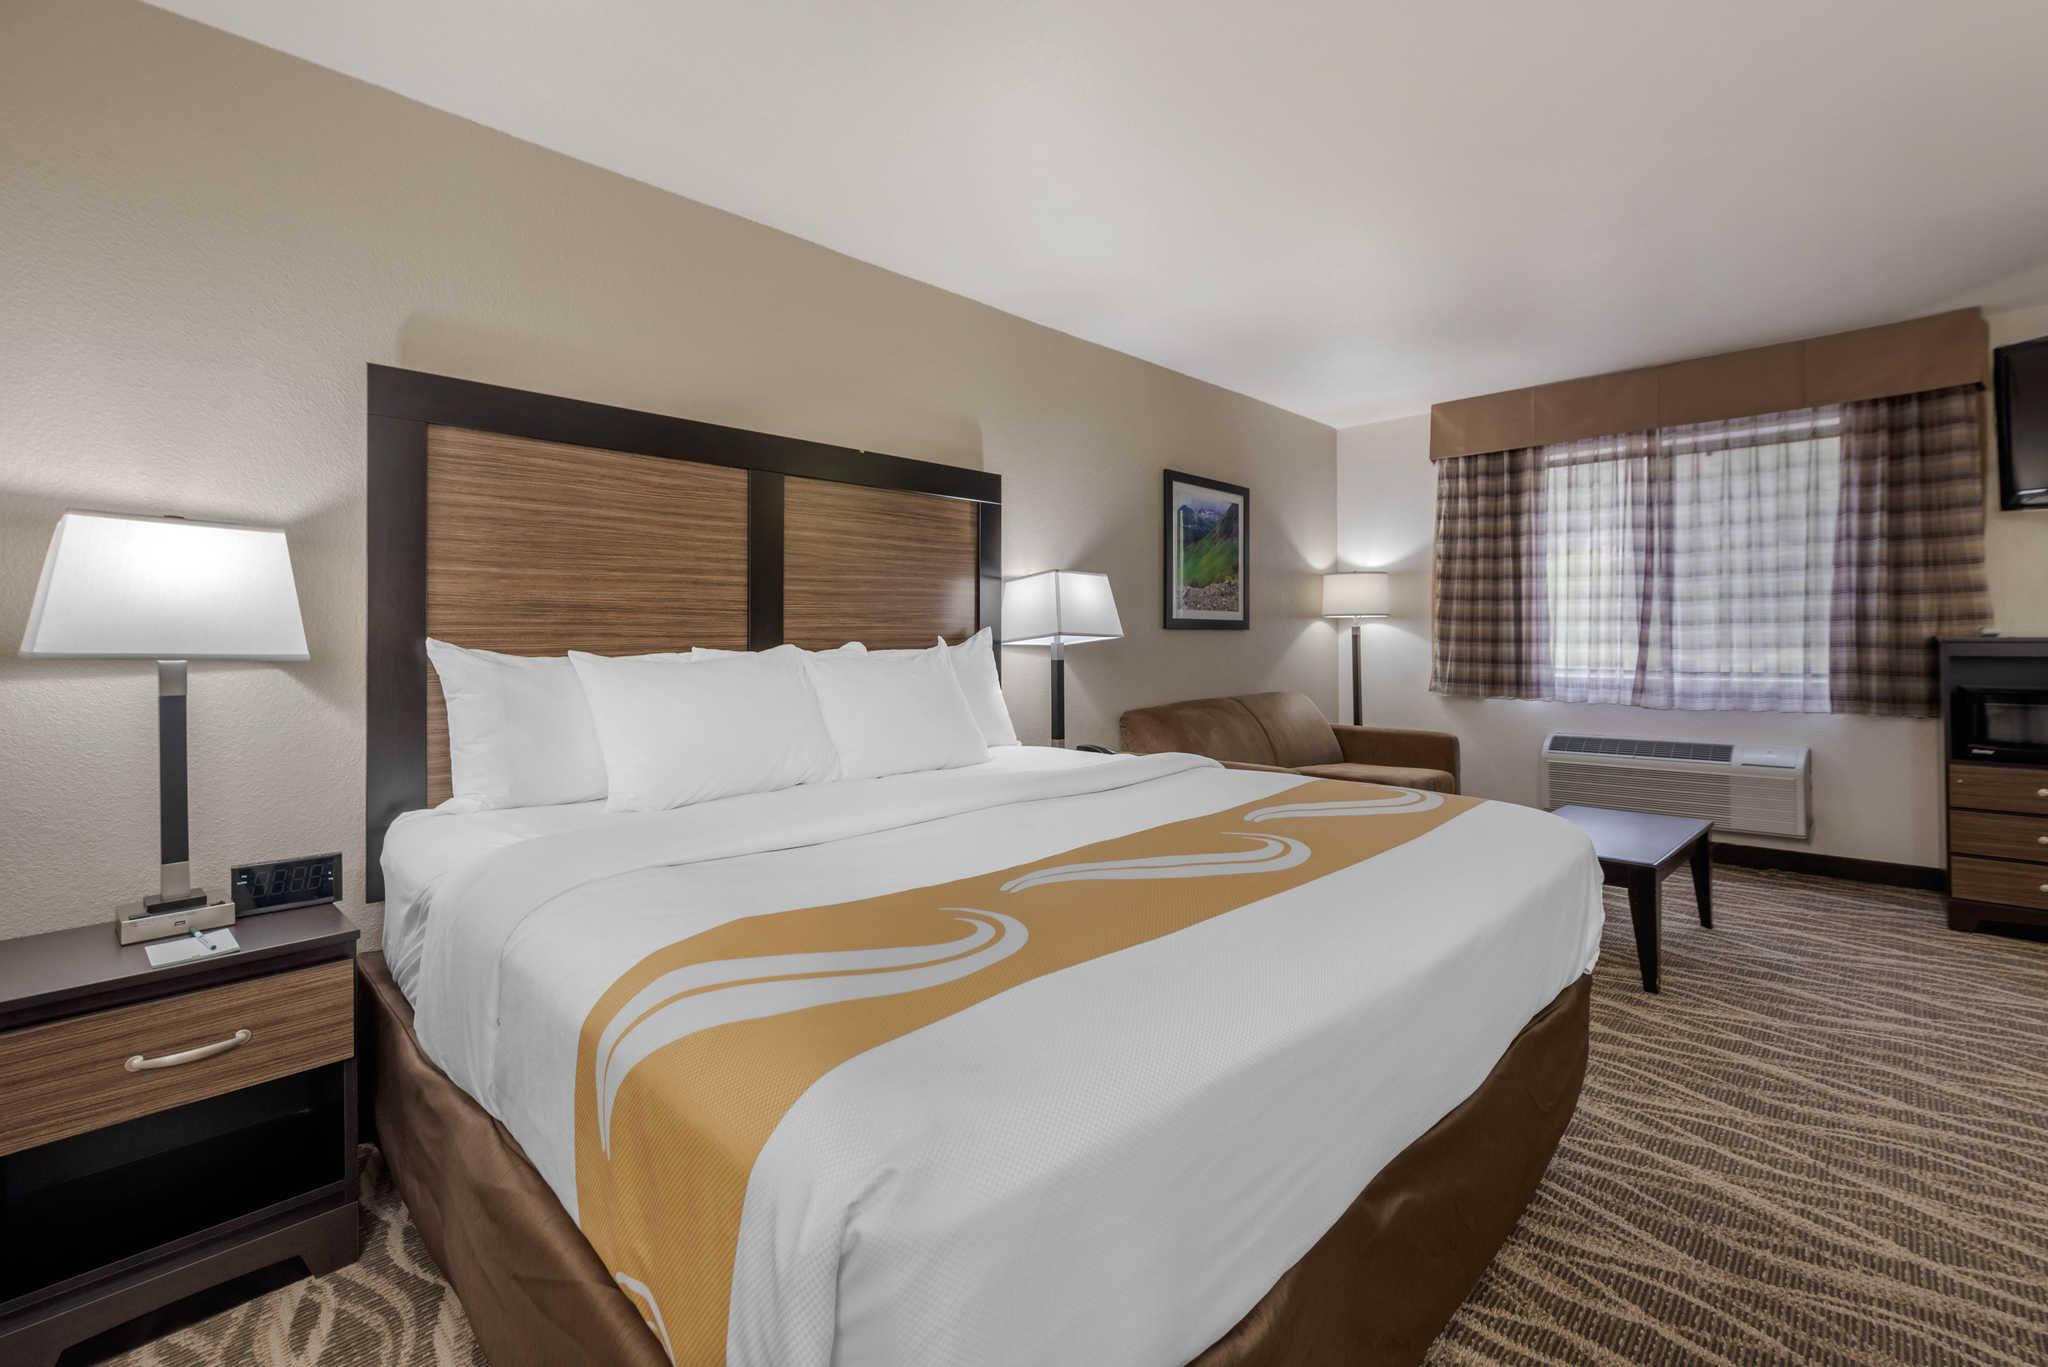 Quality Inn & Suites image 0